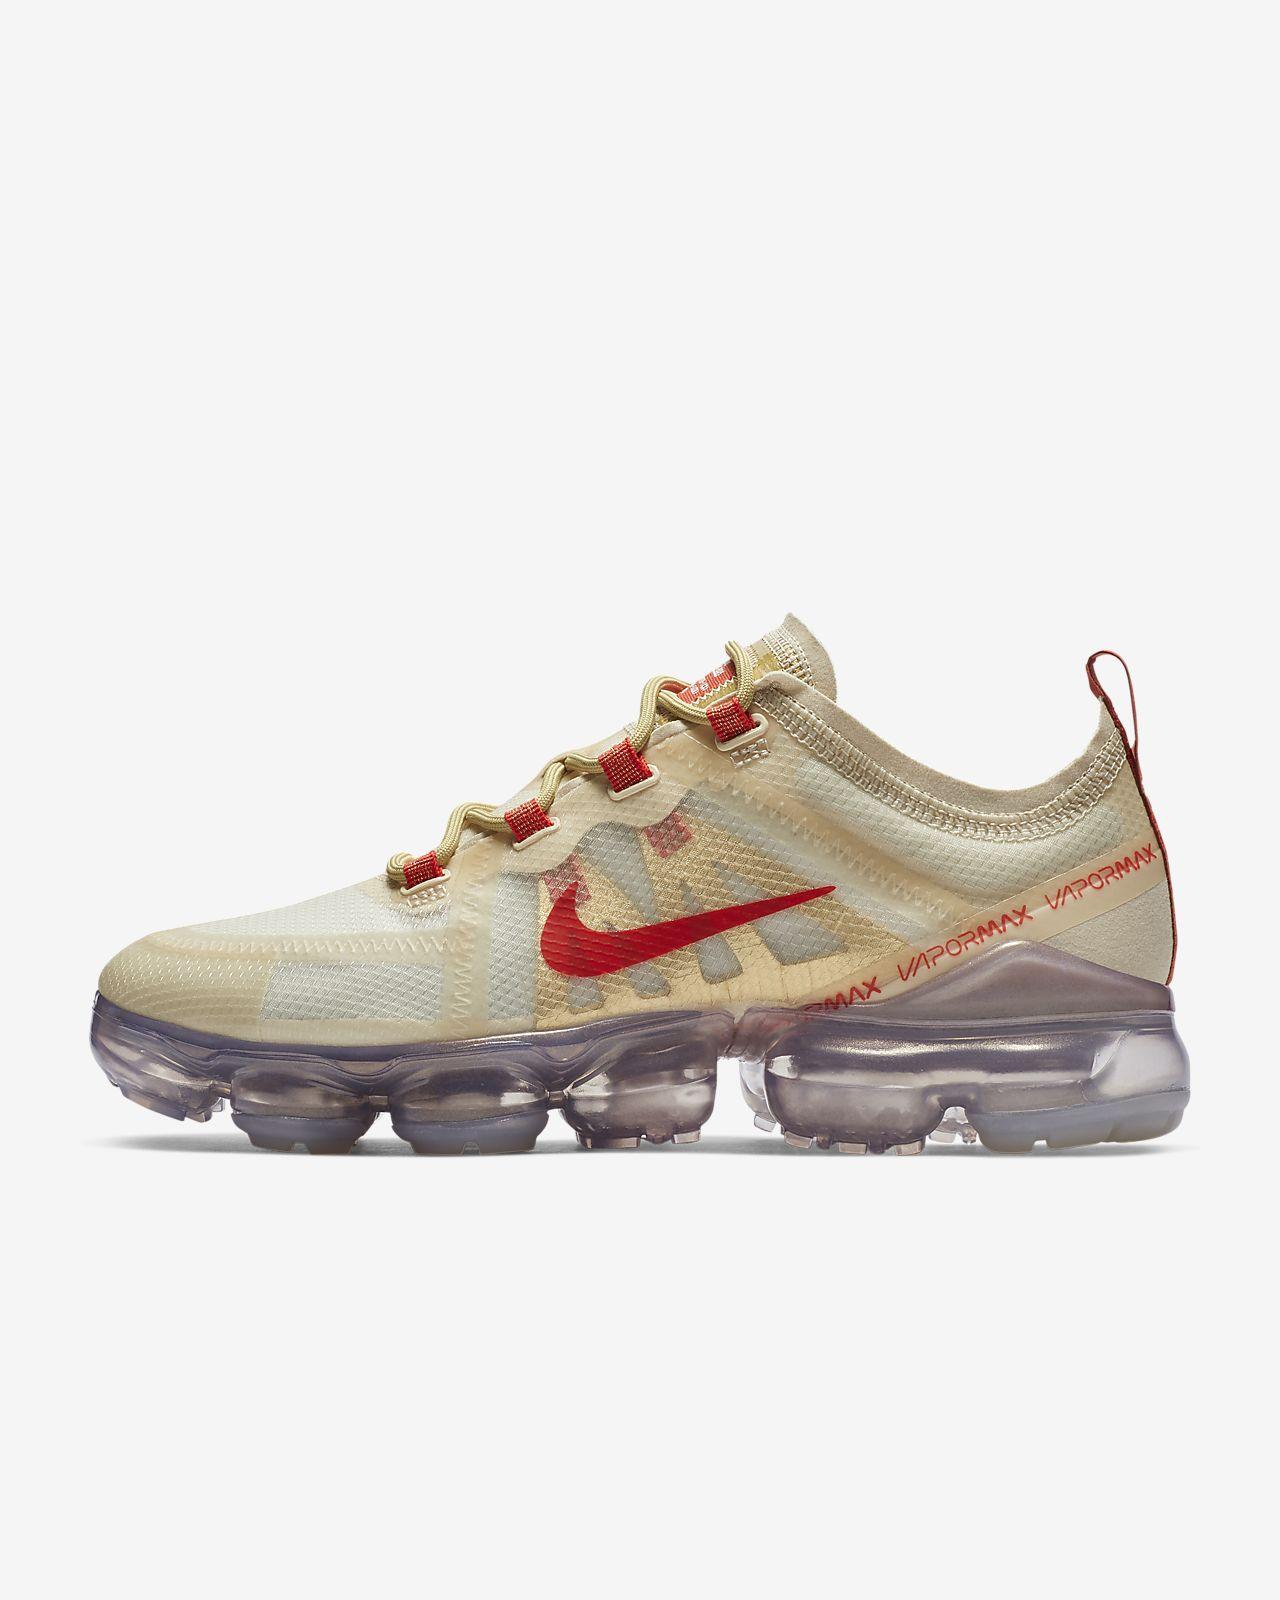 purchase cheap ceaad 6b6ba Women u0027s Running Shoe. Nike Air VaporMax 2019 CNY ...